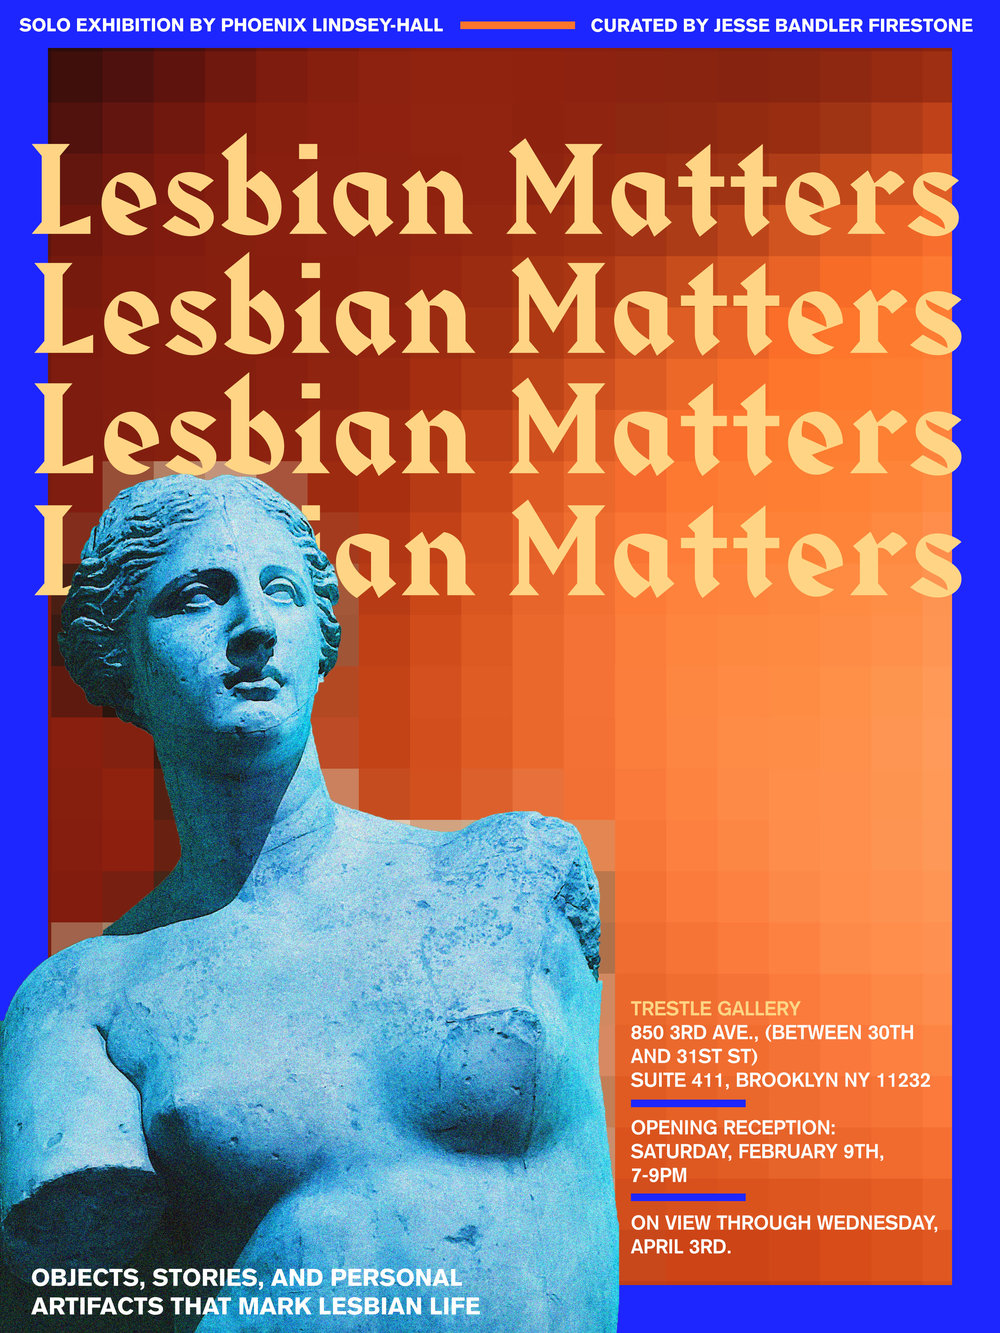 Lesbian-Matters-daria-sheveleva-1149684-unsplash.jpg